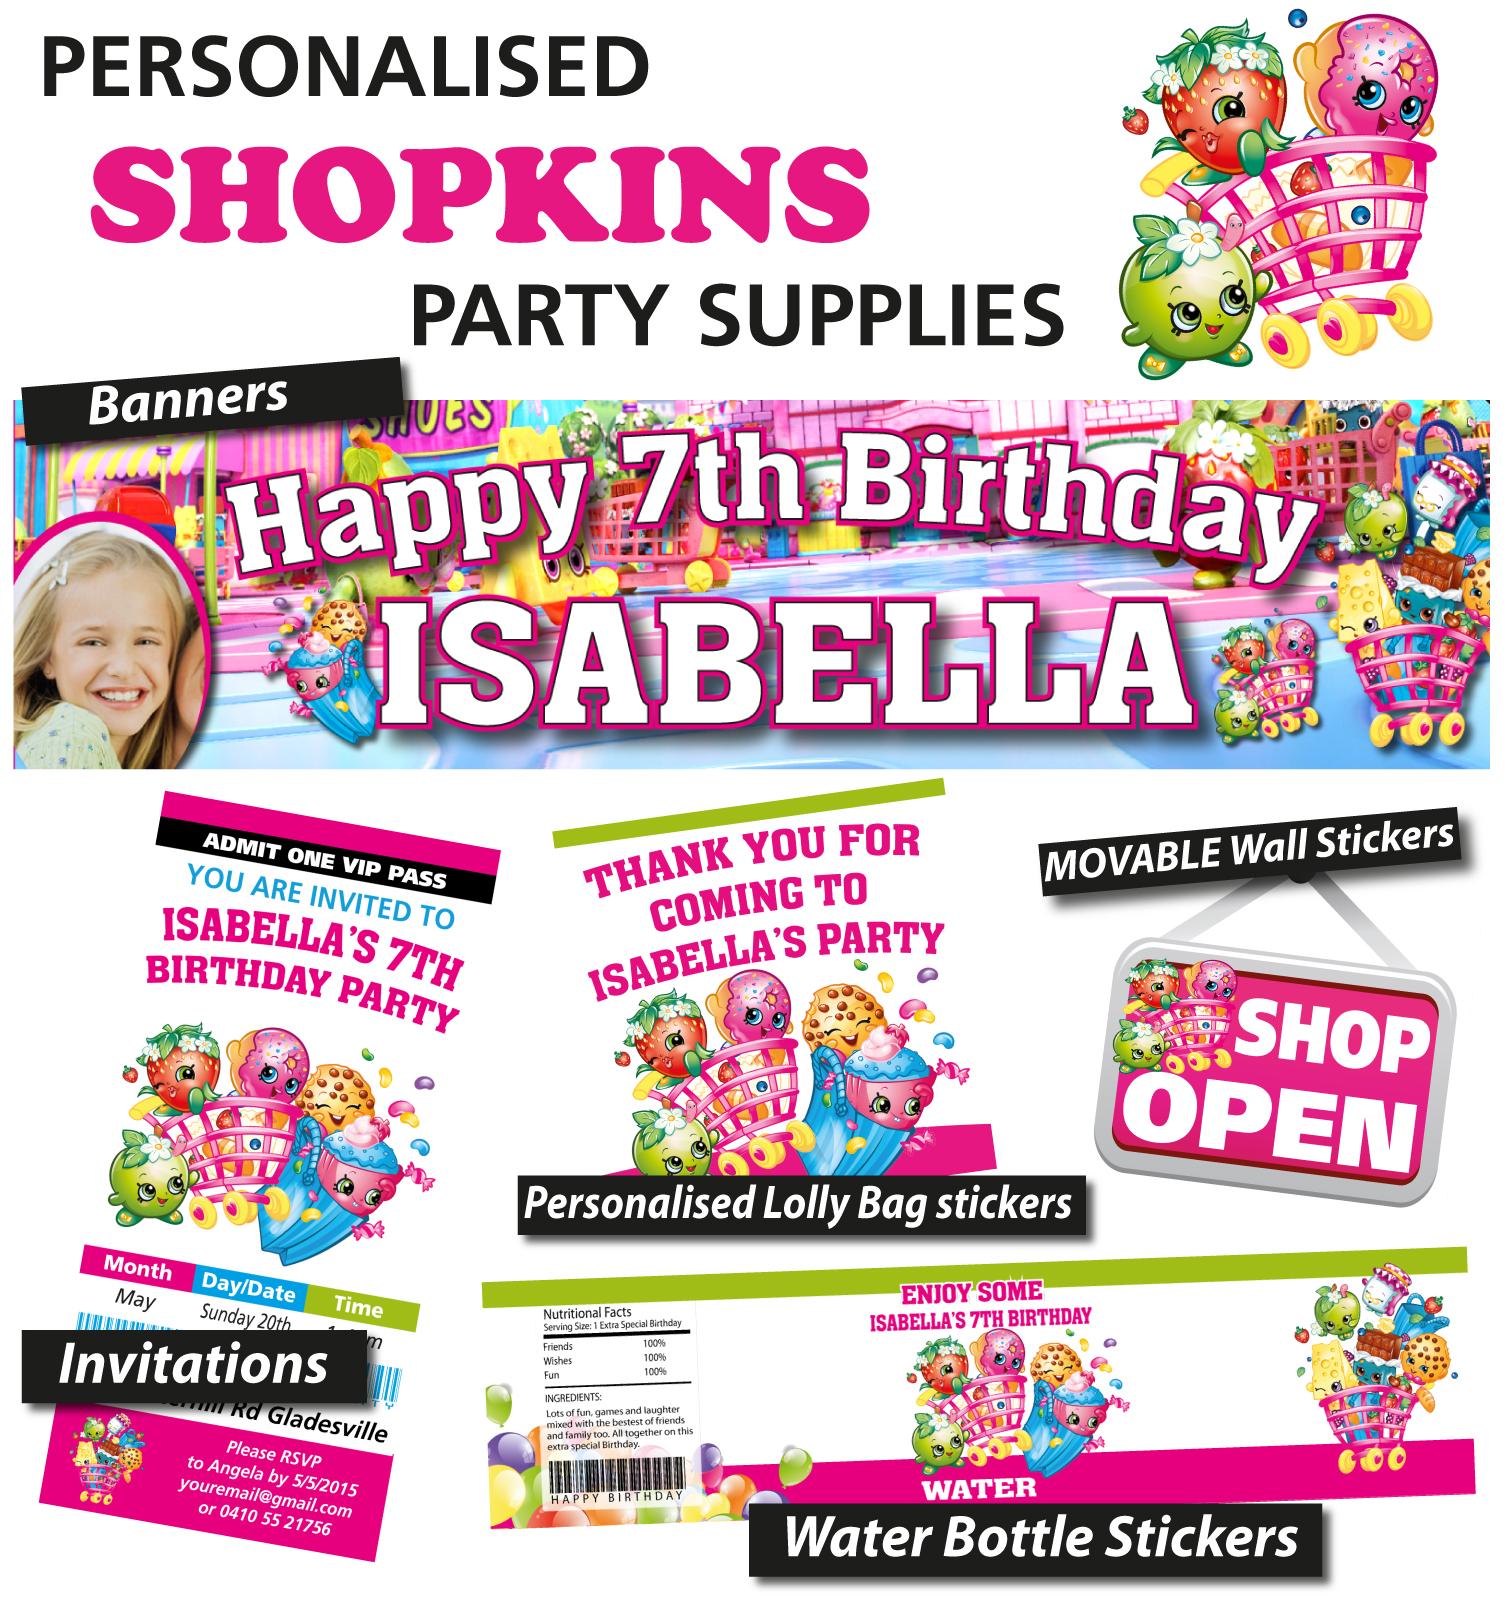 Shopkins Birthday Banner Shopkins Party Banner: Personalised Shopkins Birthday Party Banners Decoration